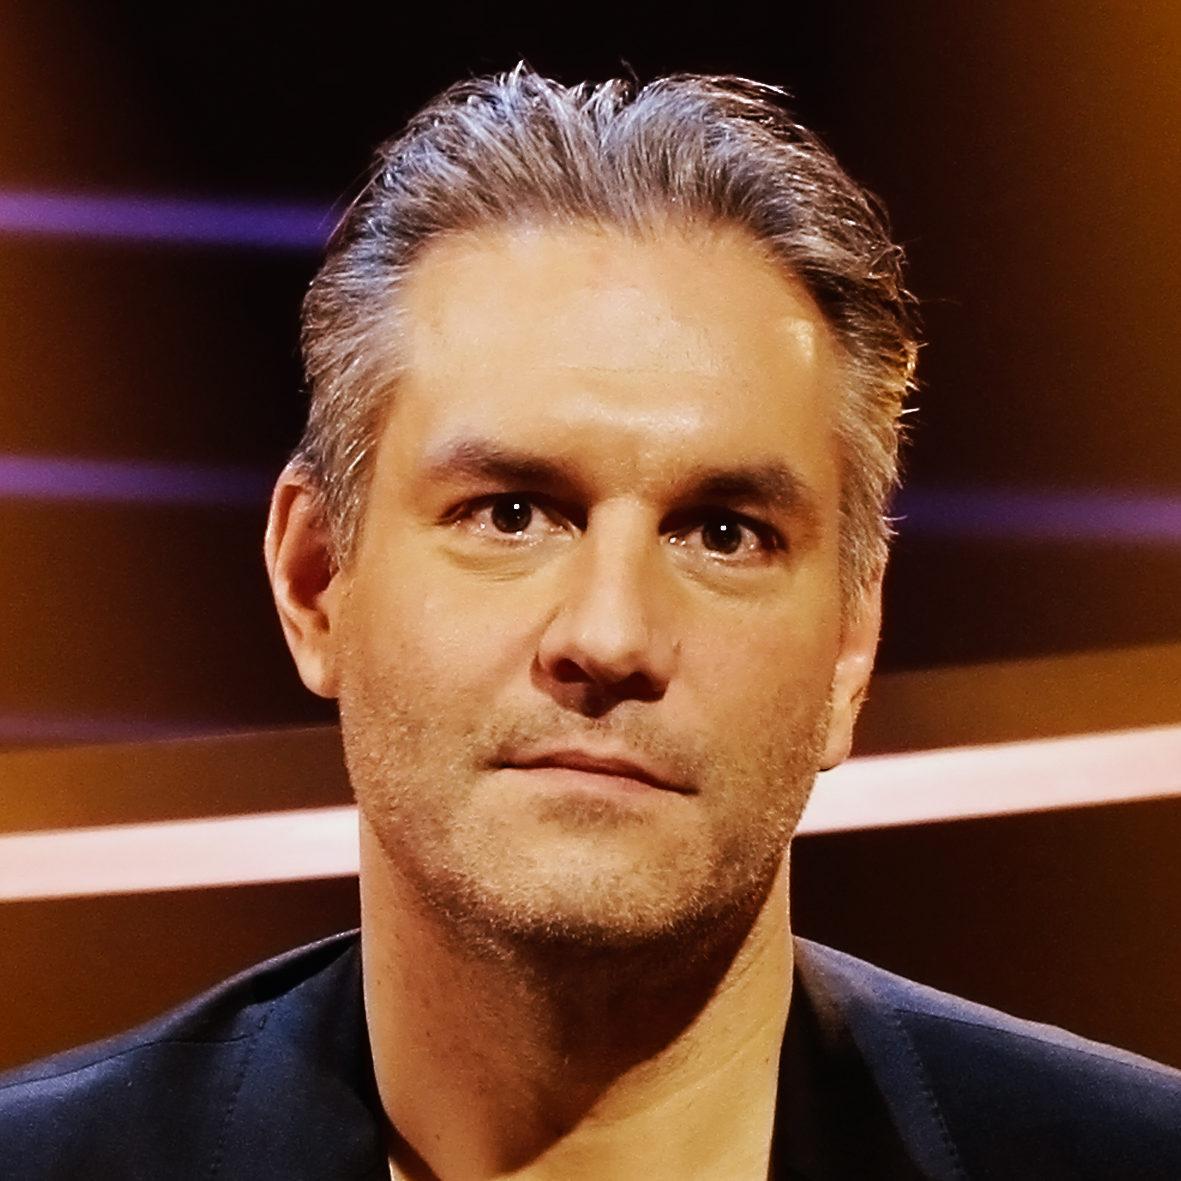 Christian Peter Hauser